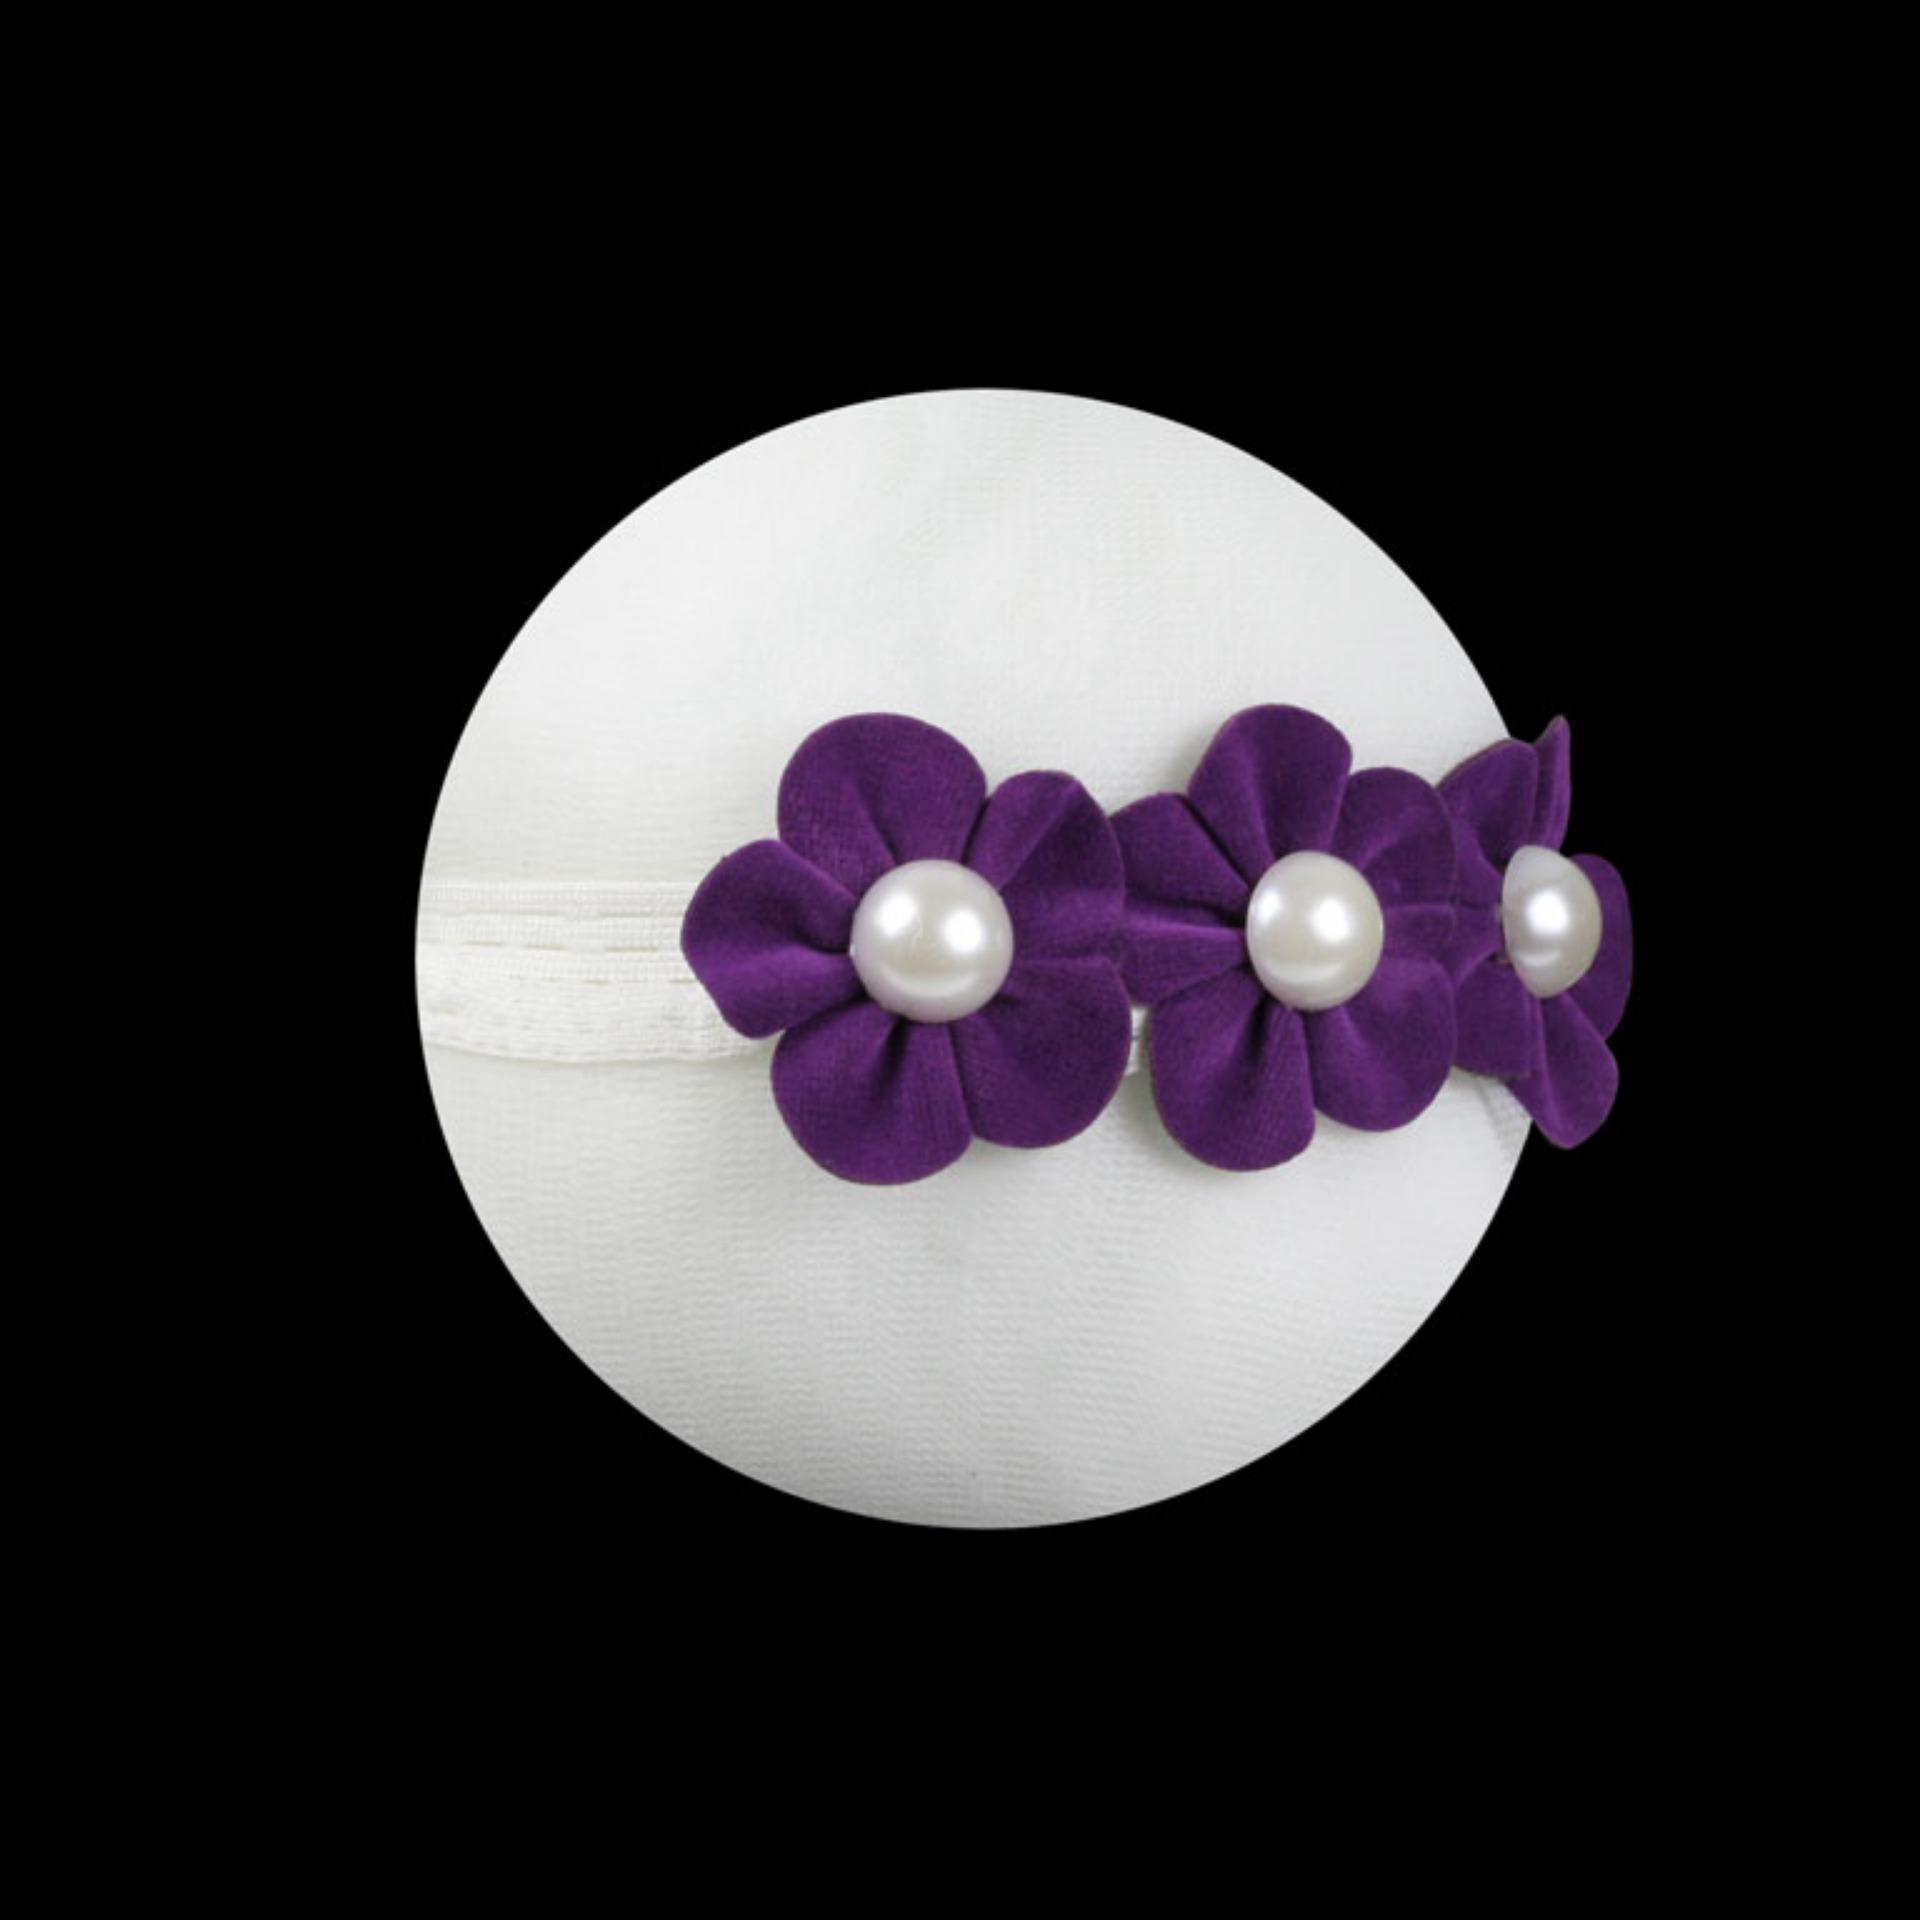 Tamagoo Headband Baby Girl Aksesoris Bayi Perempuan - Monic Purple